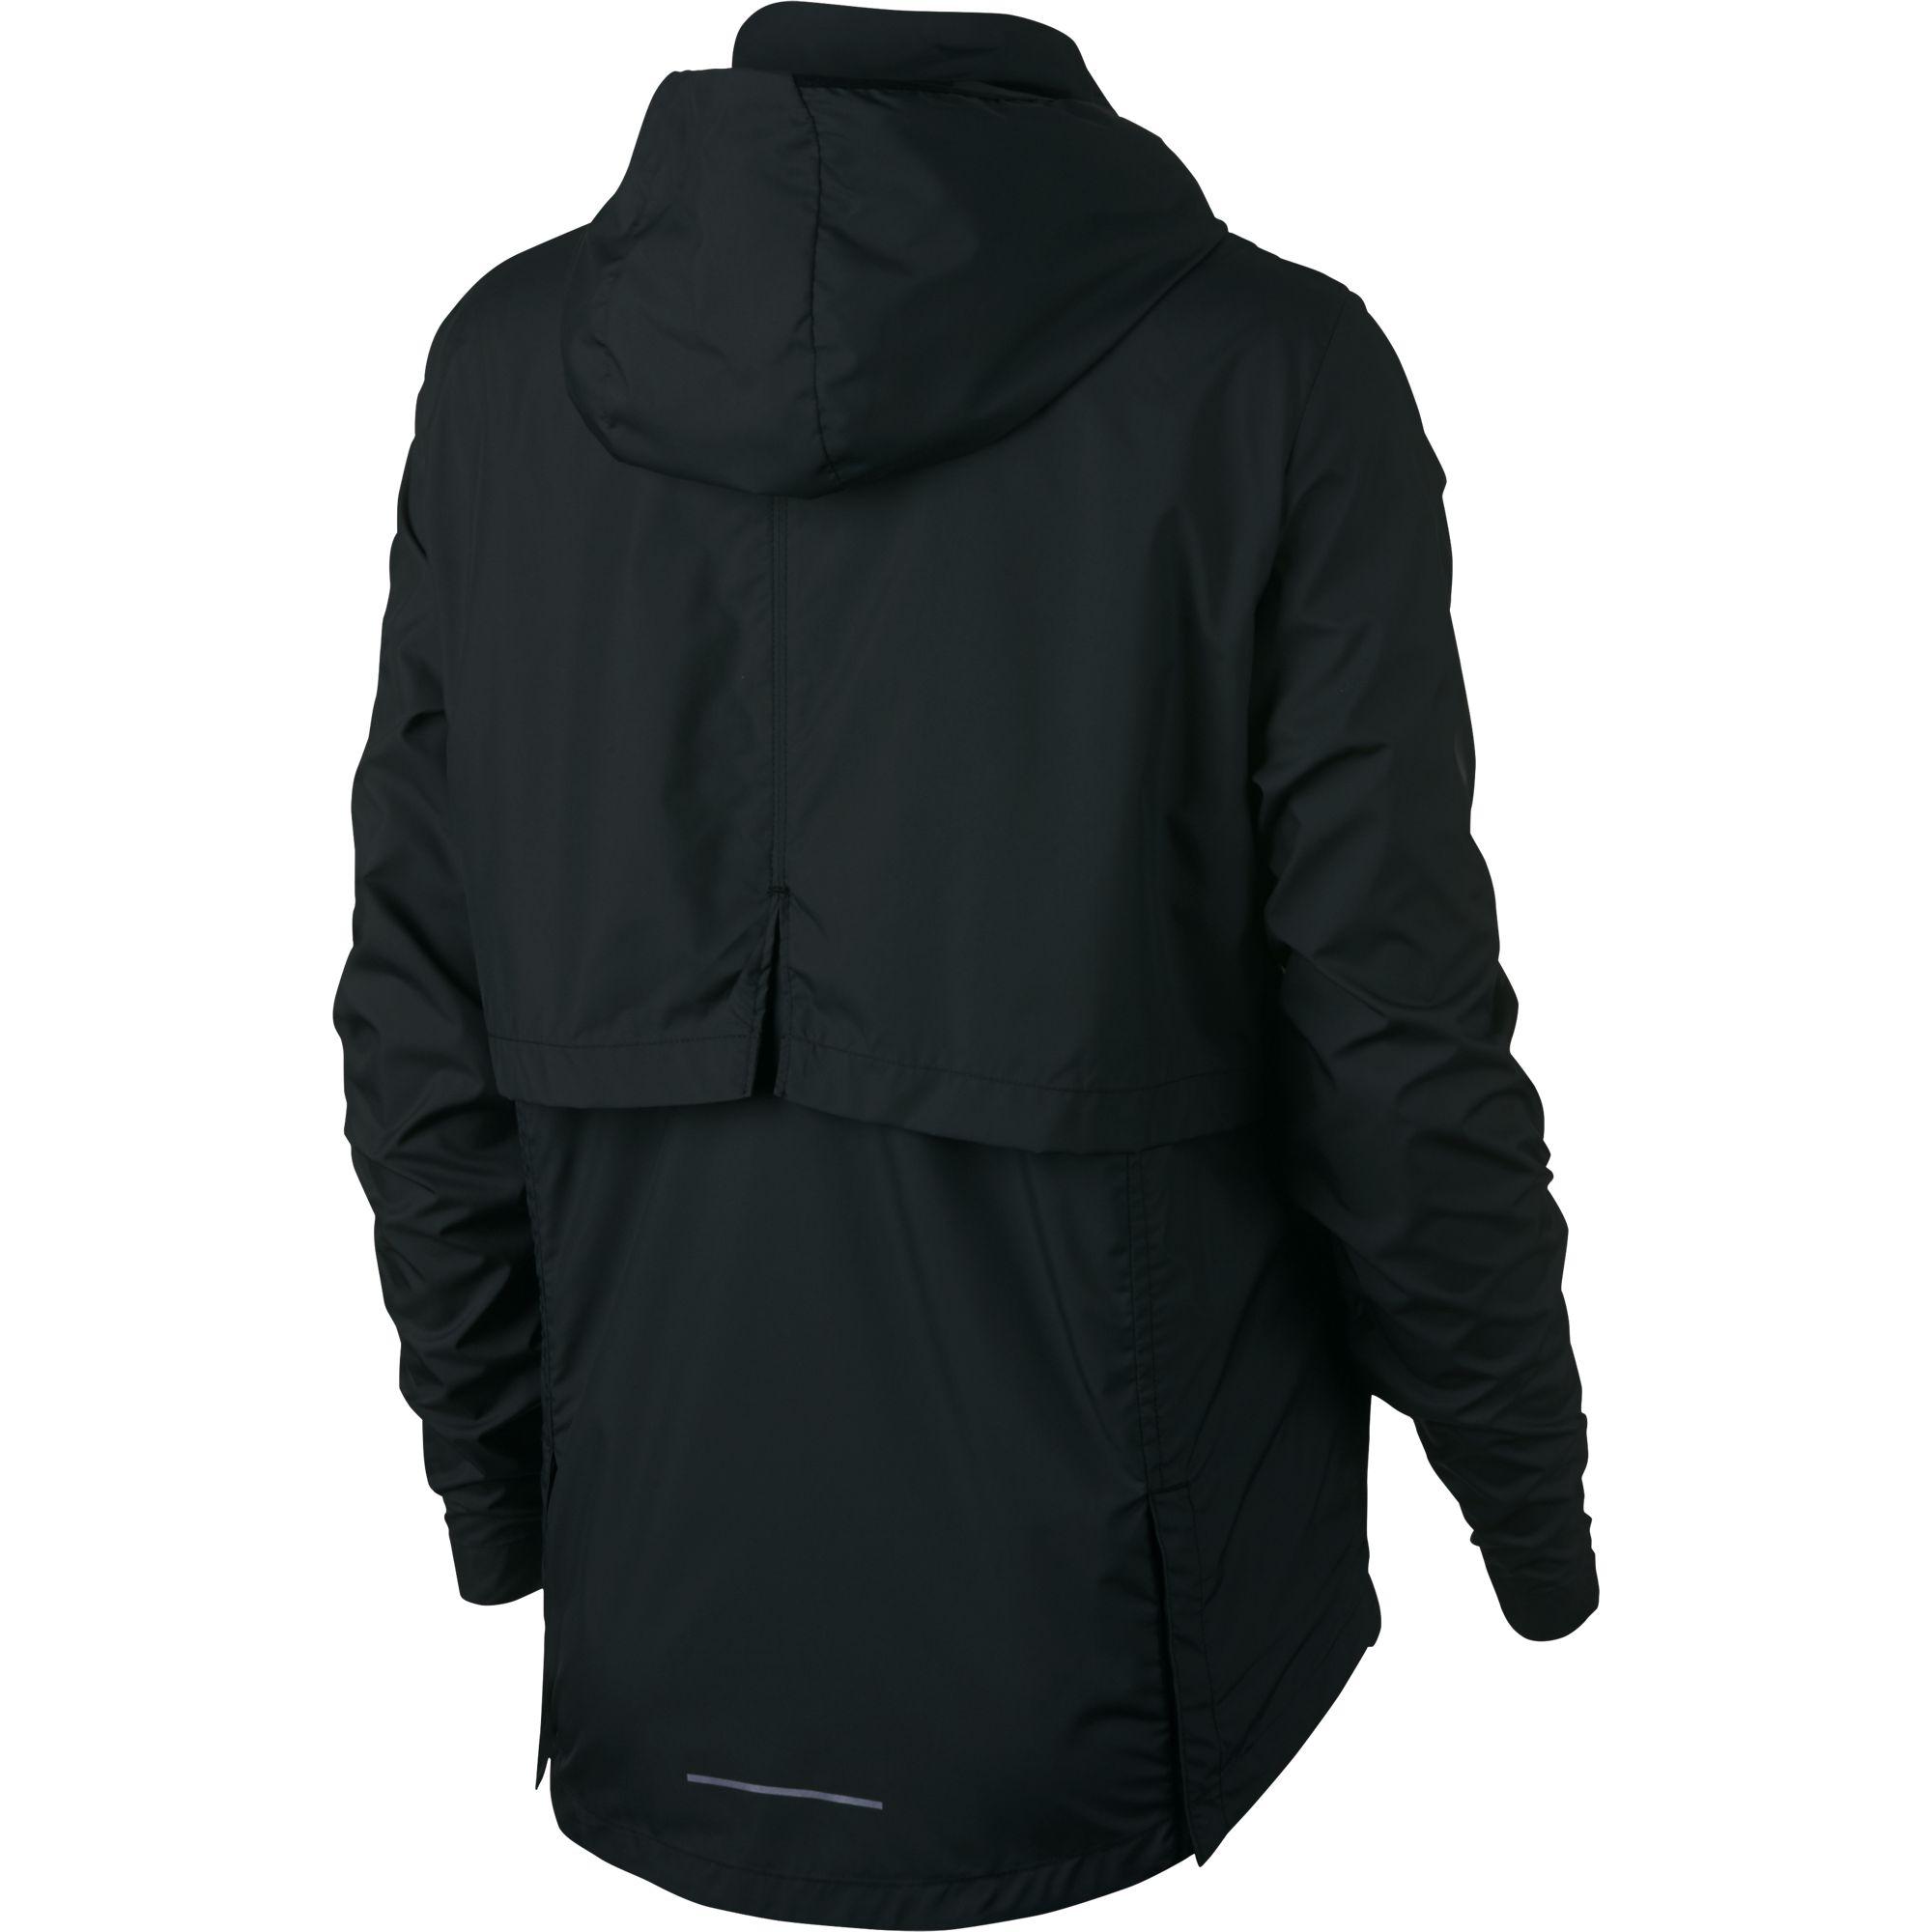 Women's Essential Packable Running Rain Jacket